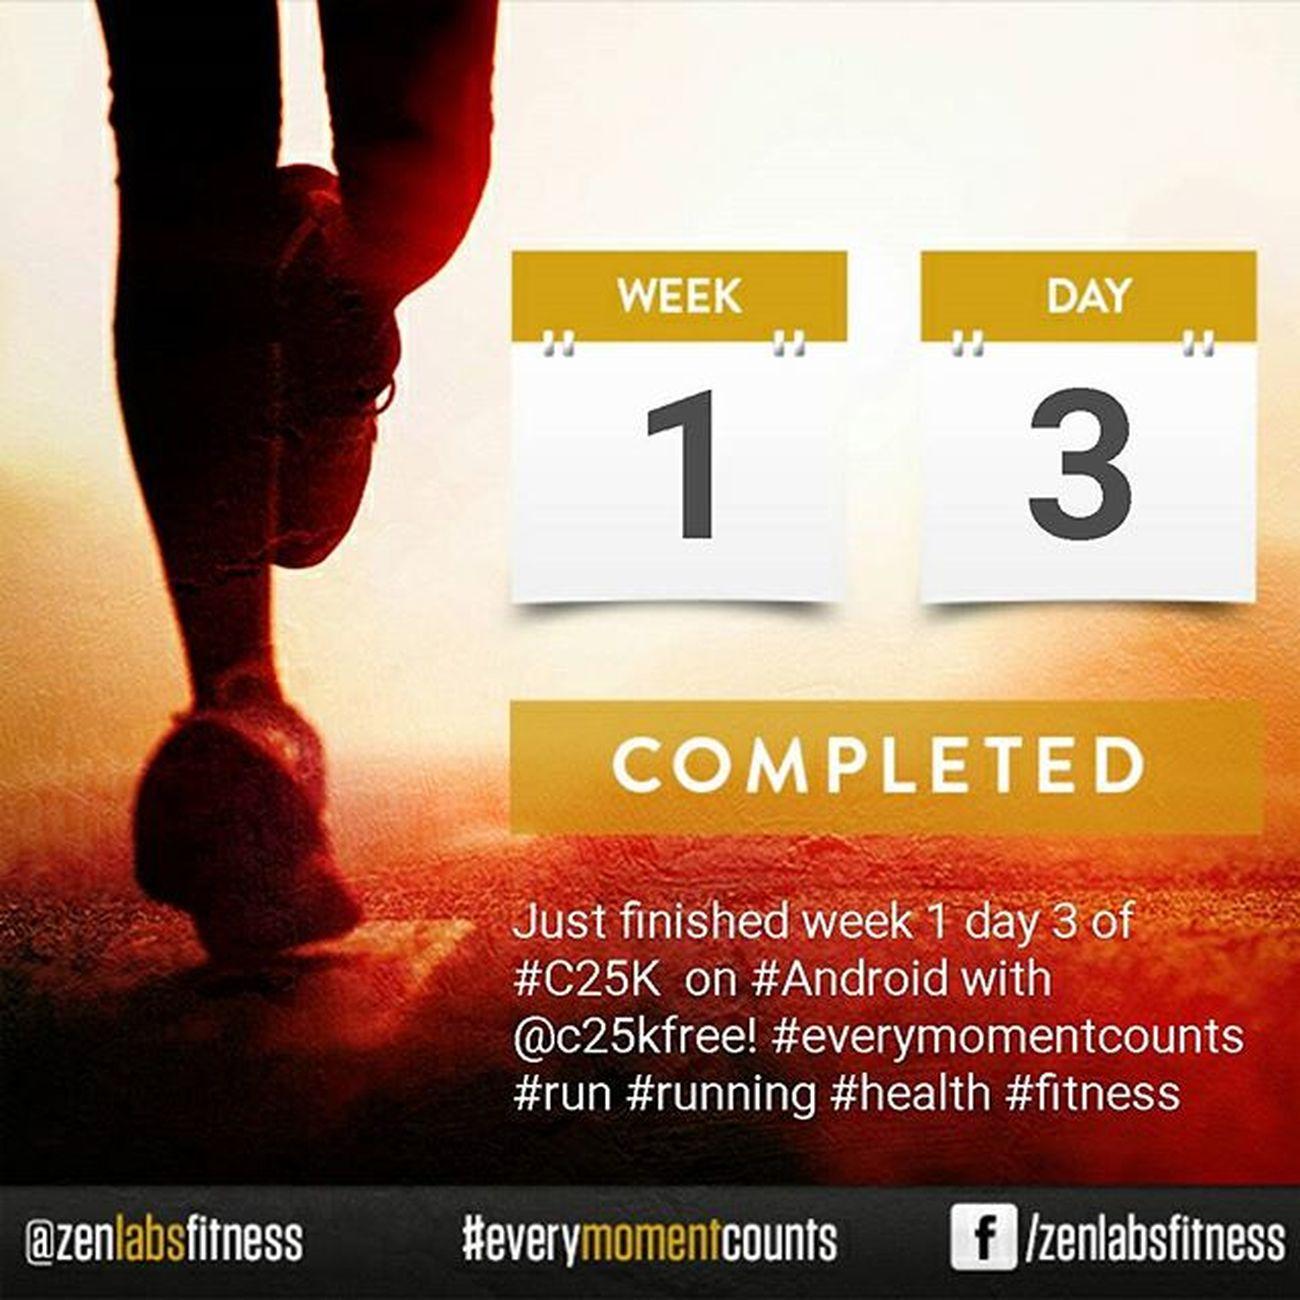 C25k Week1day3 Run Running Health Fitness EveryMomentCounts